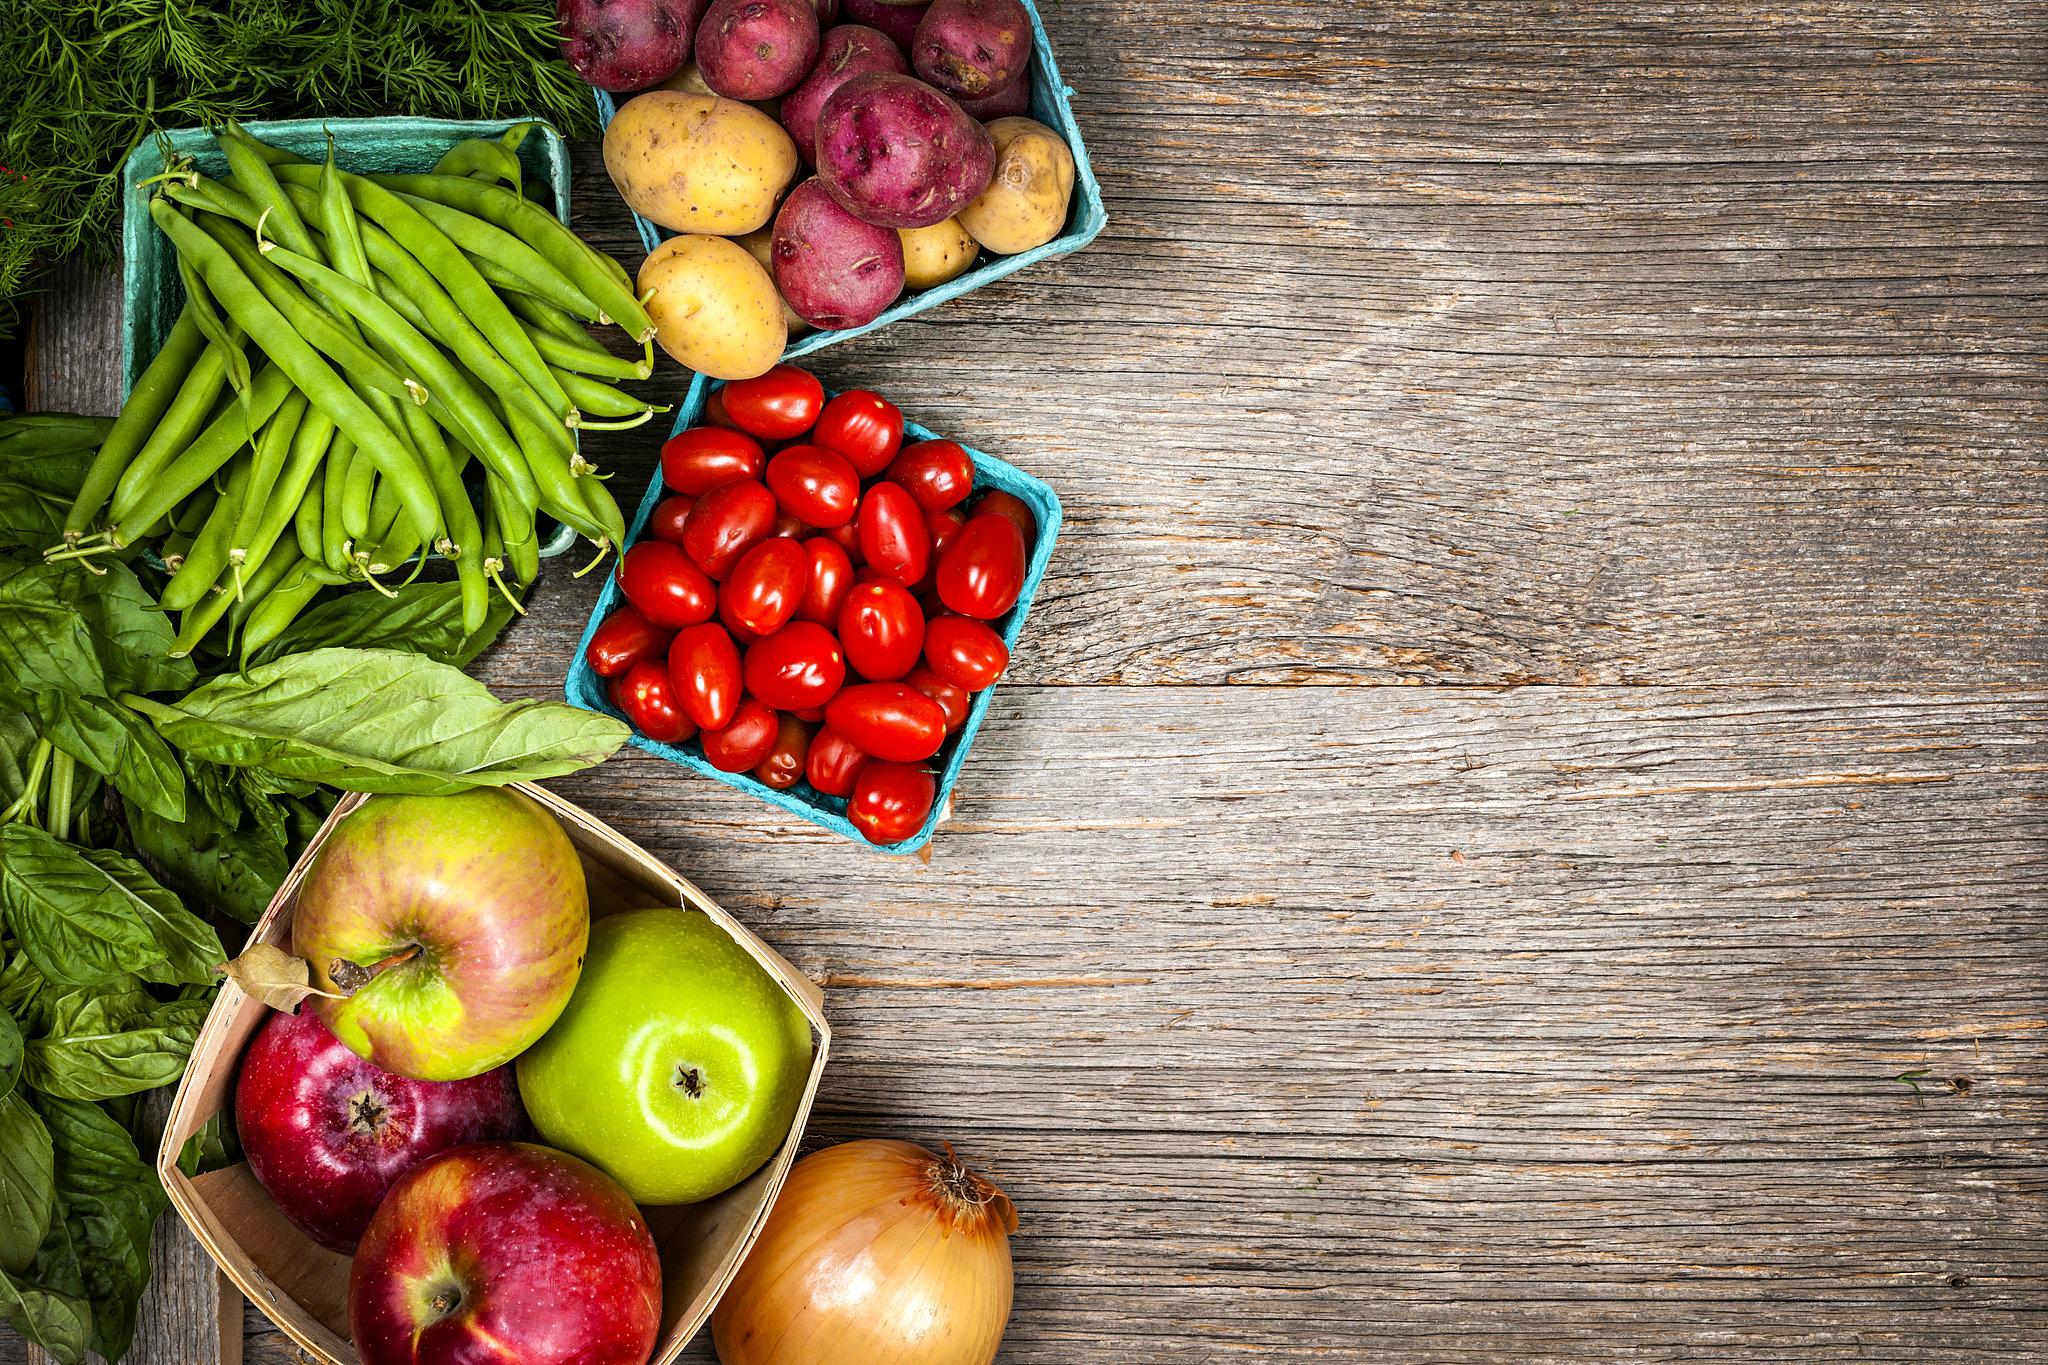 dieta dimagrante efficace e facile